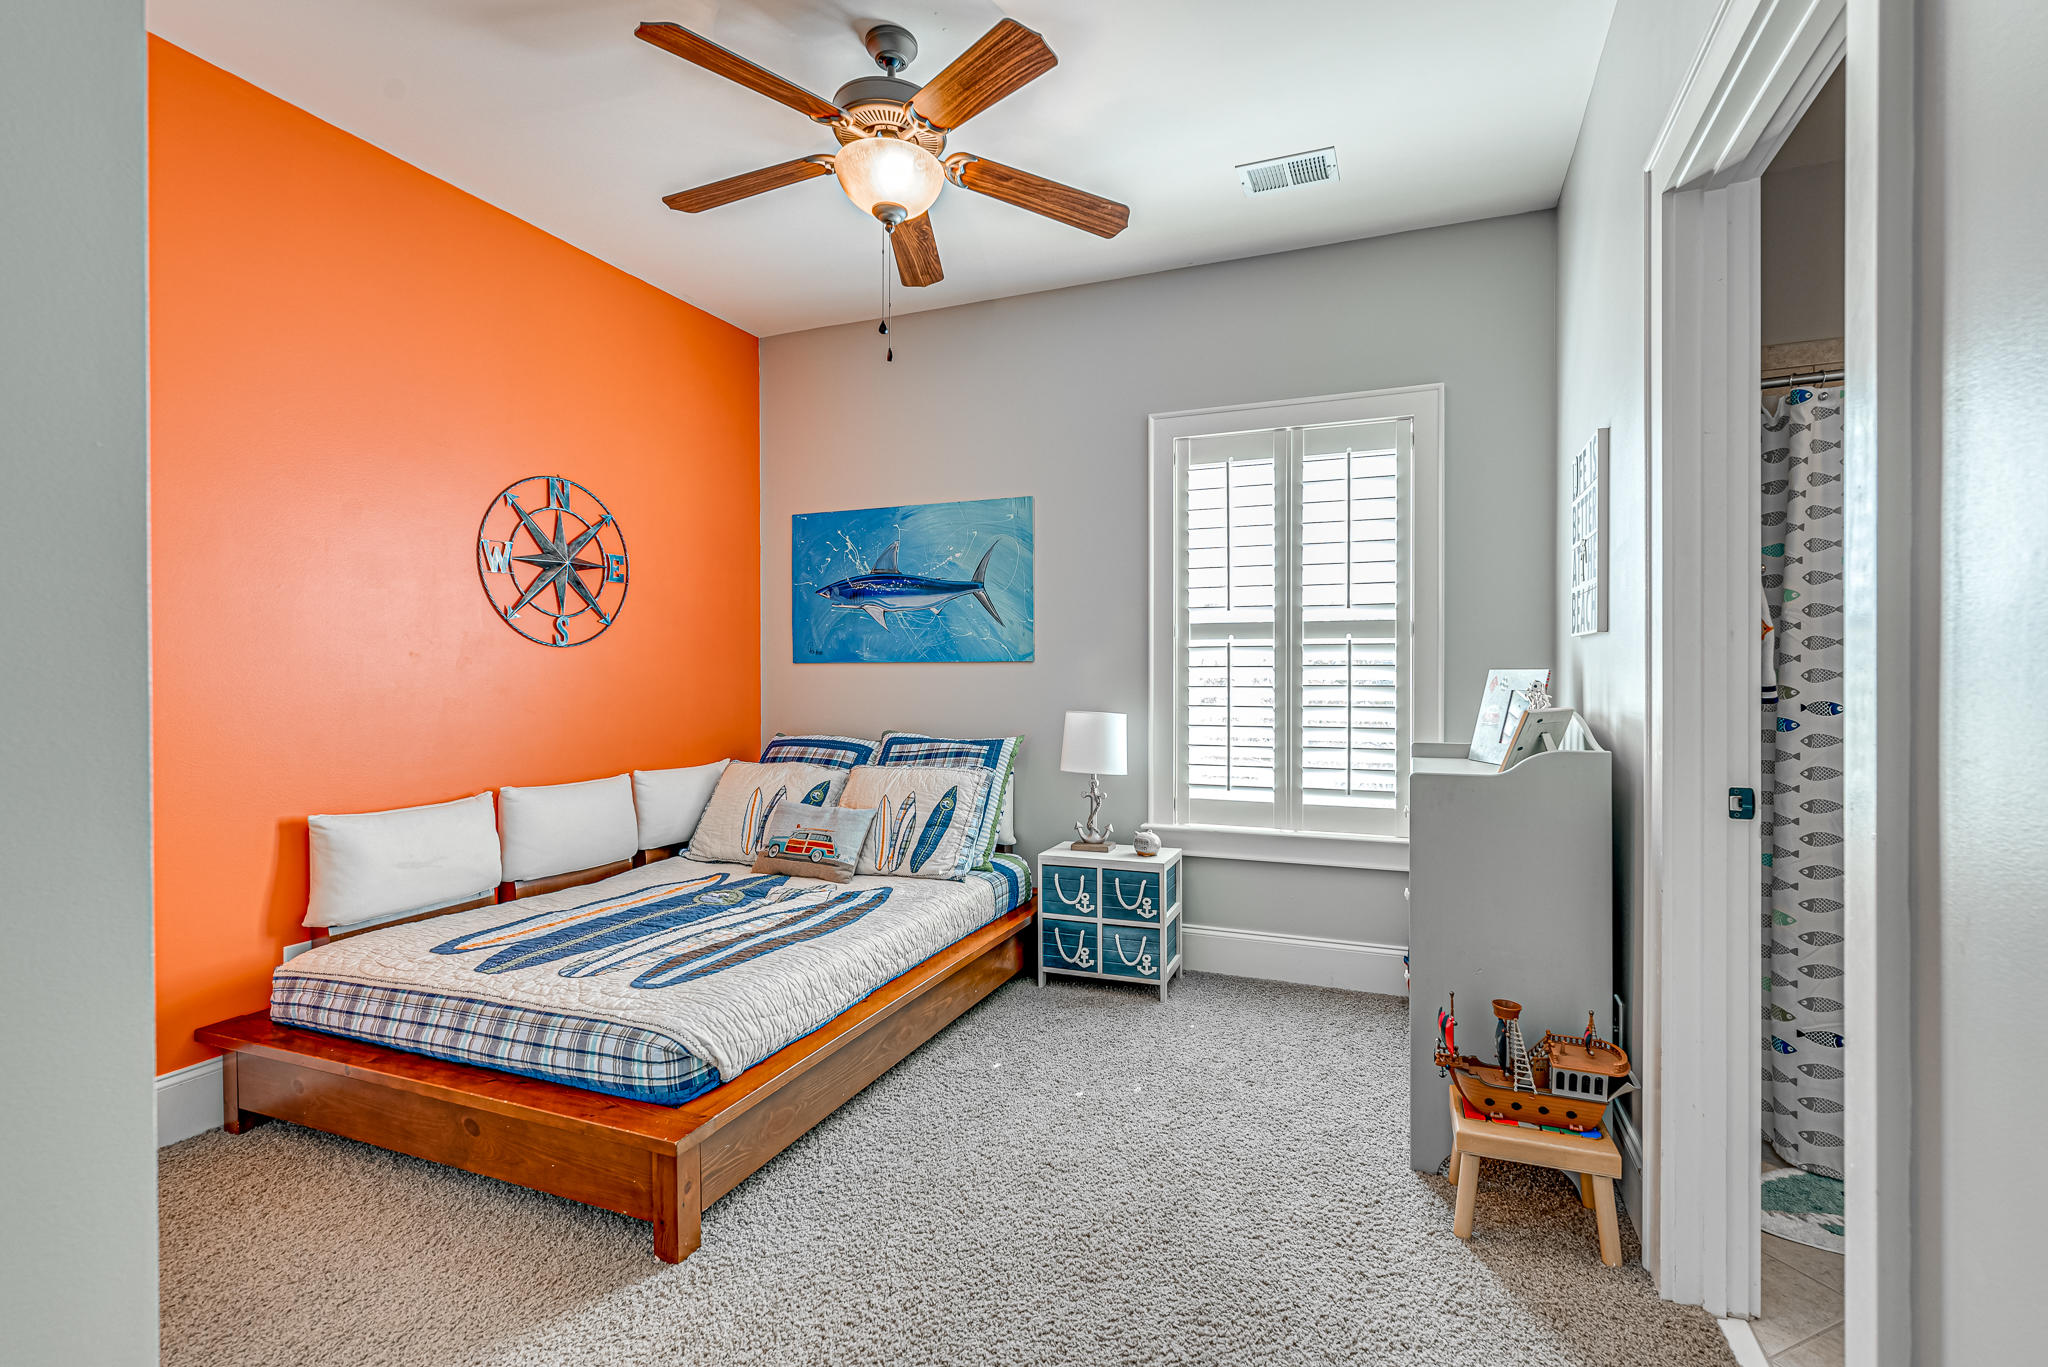 Daniel Island Smythe Park Homes For Sale - 1410 Wando View, Charleston, SC - 58